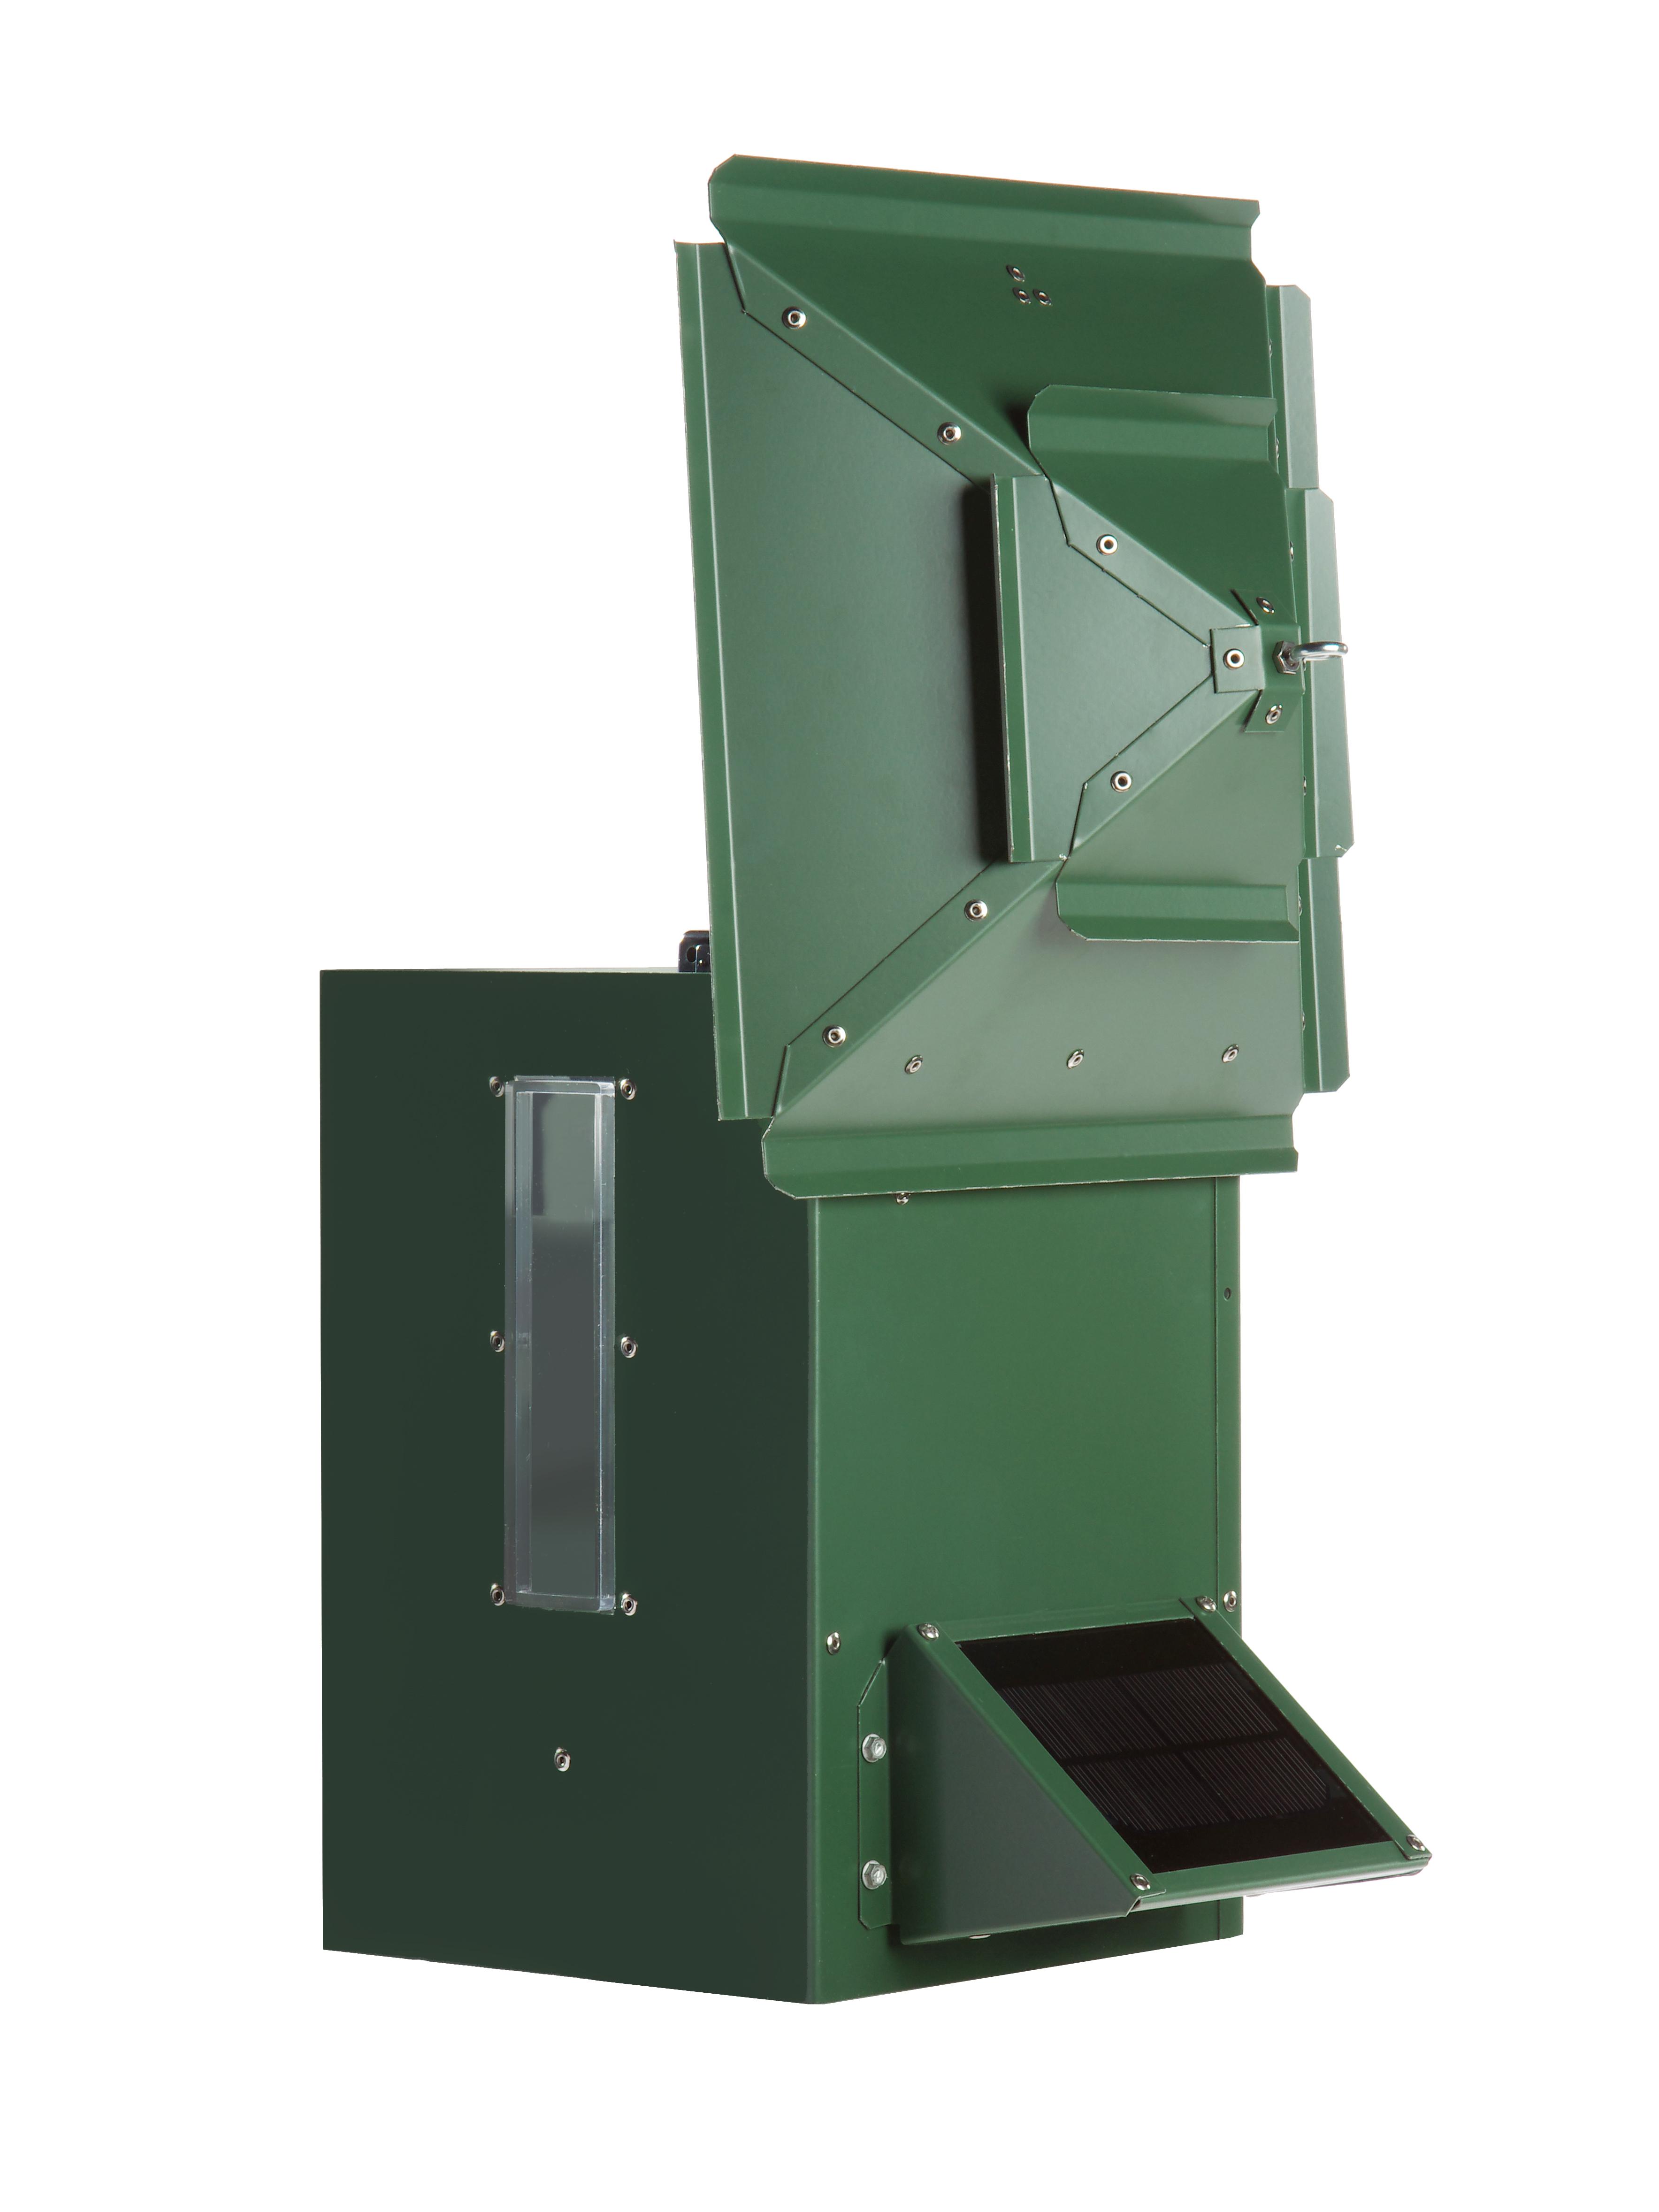 Koi café automatic feeder sweeney feeders